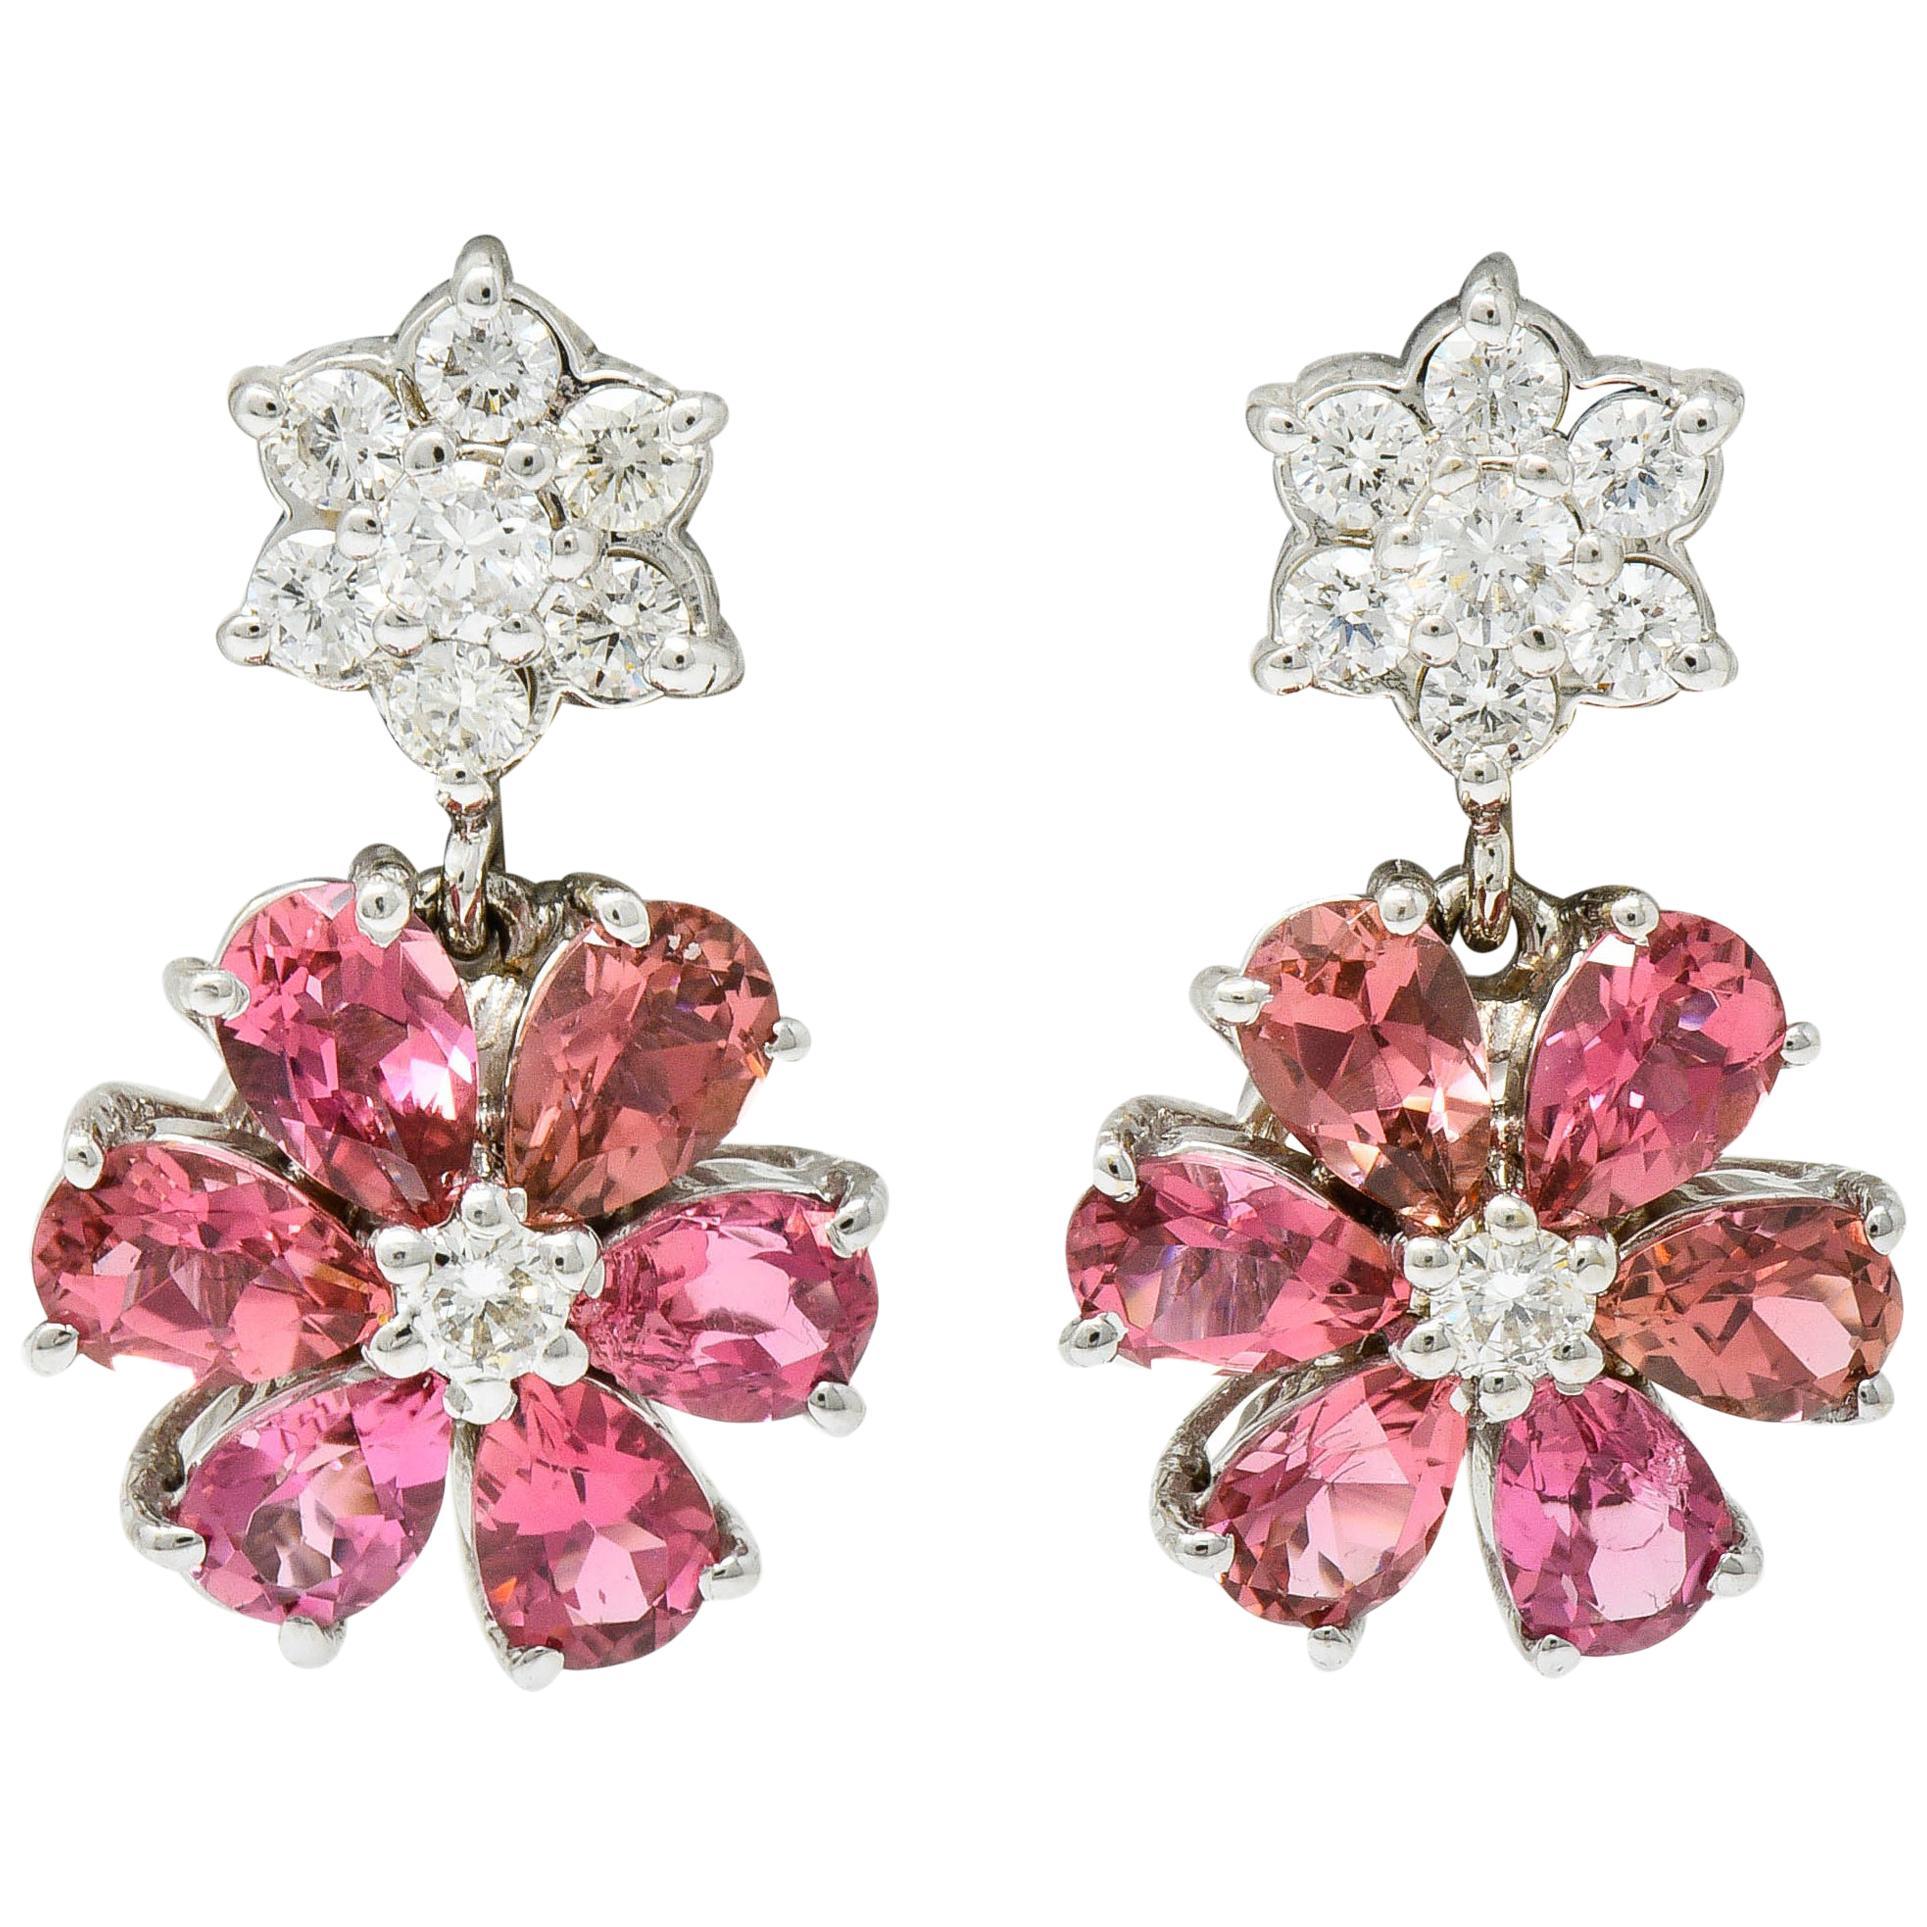 Contemporary Pink Tourmaline Diamond 18 Karat White Floral Cluster Drop Earrings